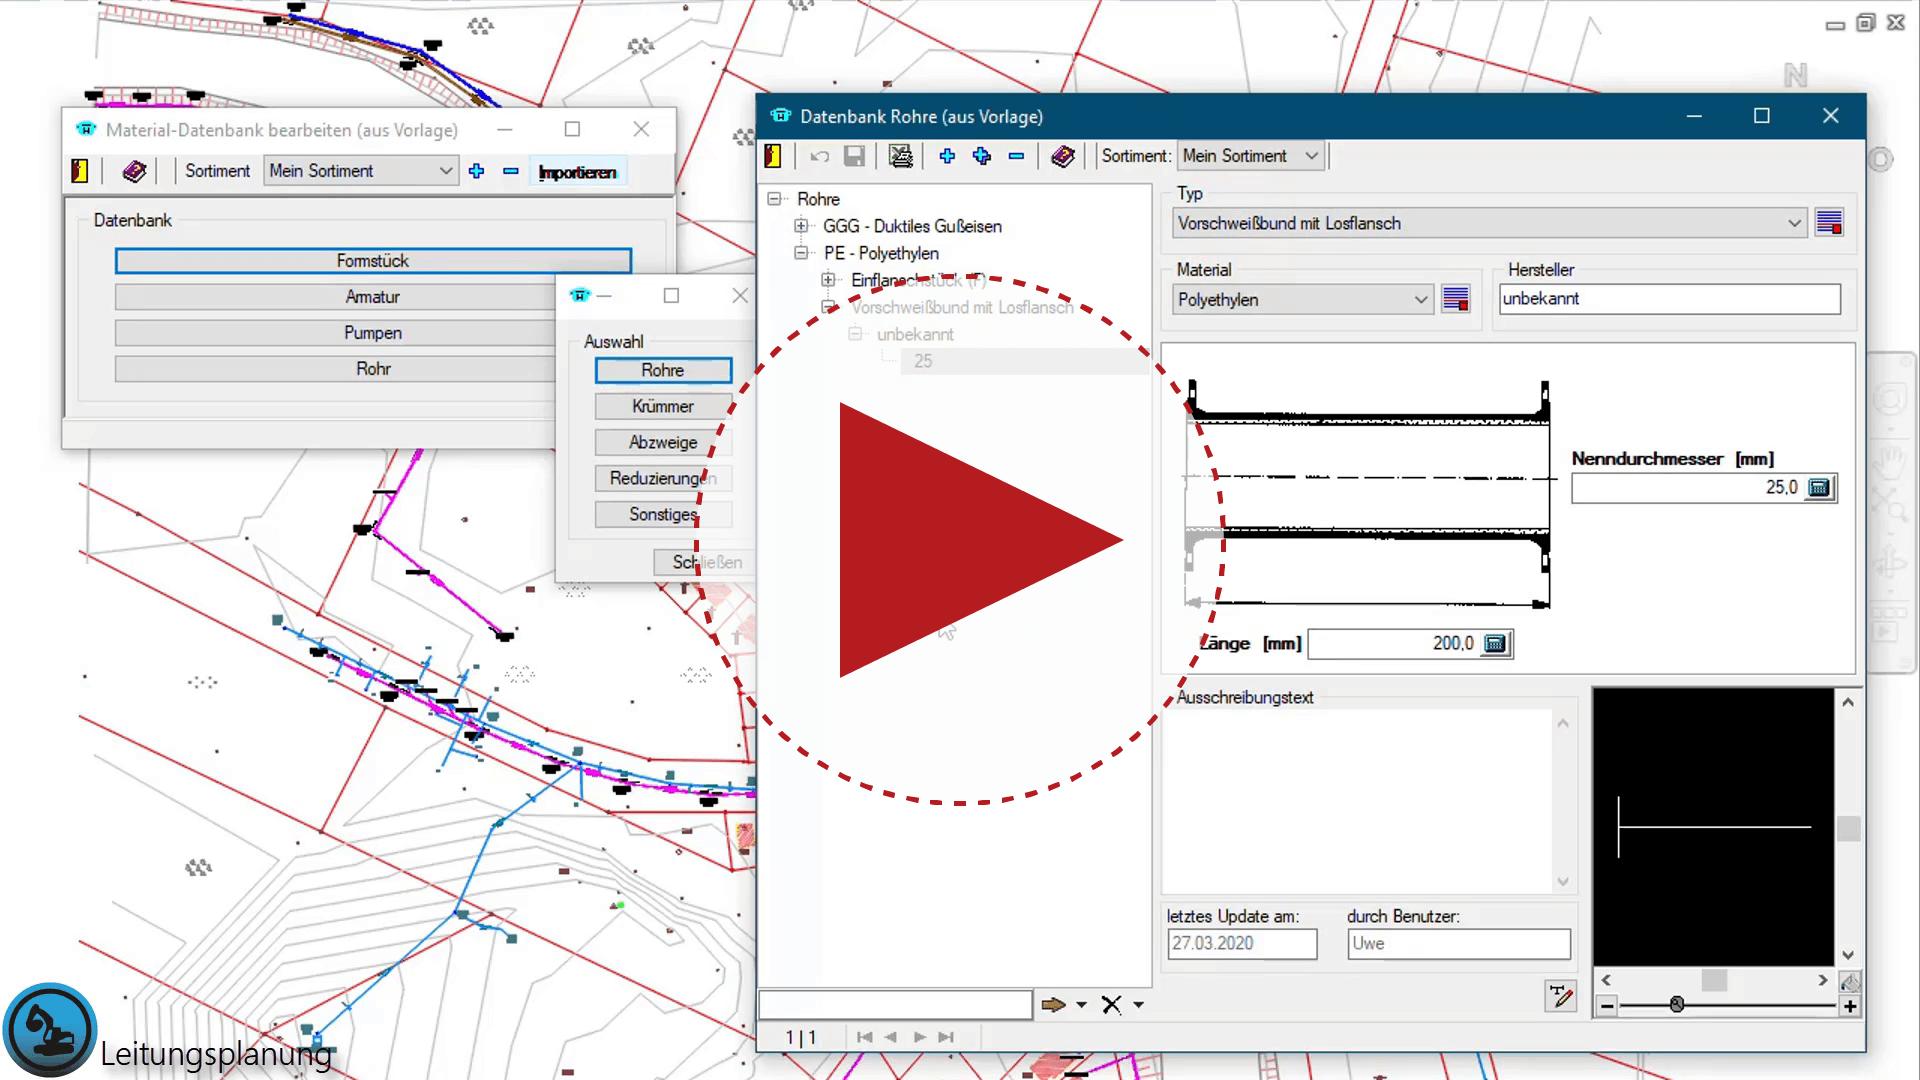 Video: Leitungsplanung, Bauteil zur Materialdatenbank hinzufügen